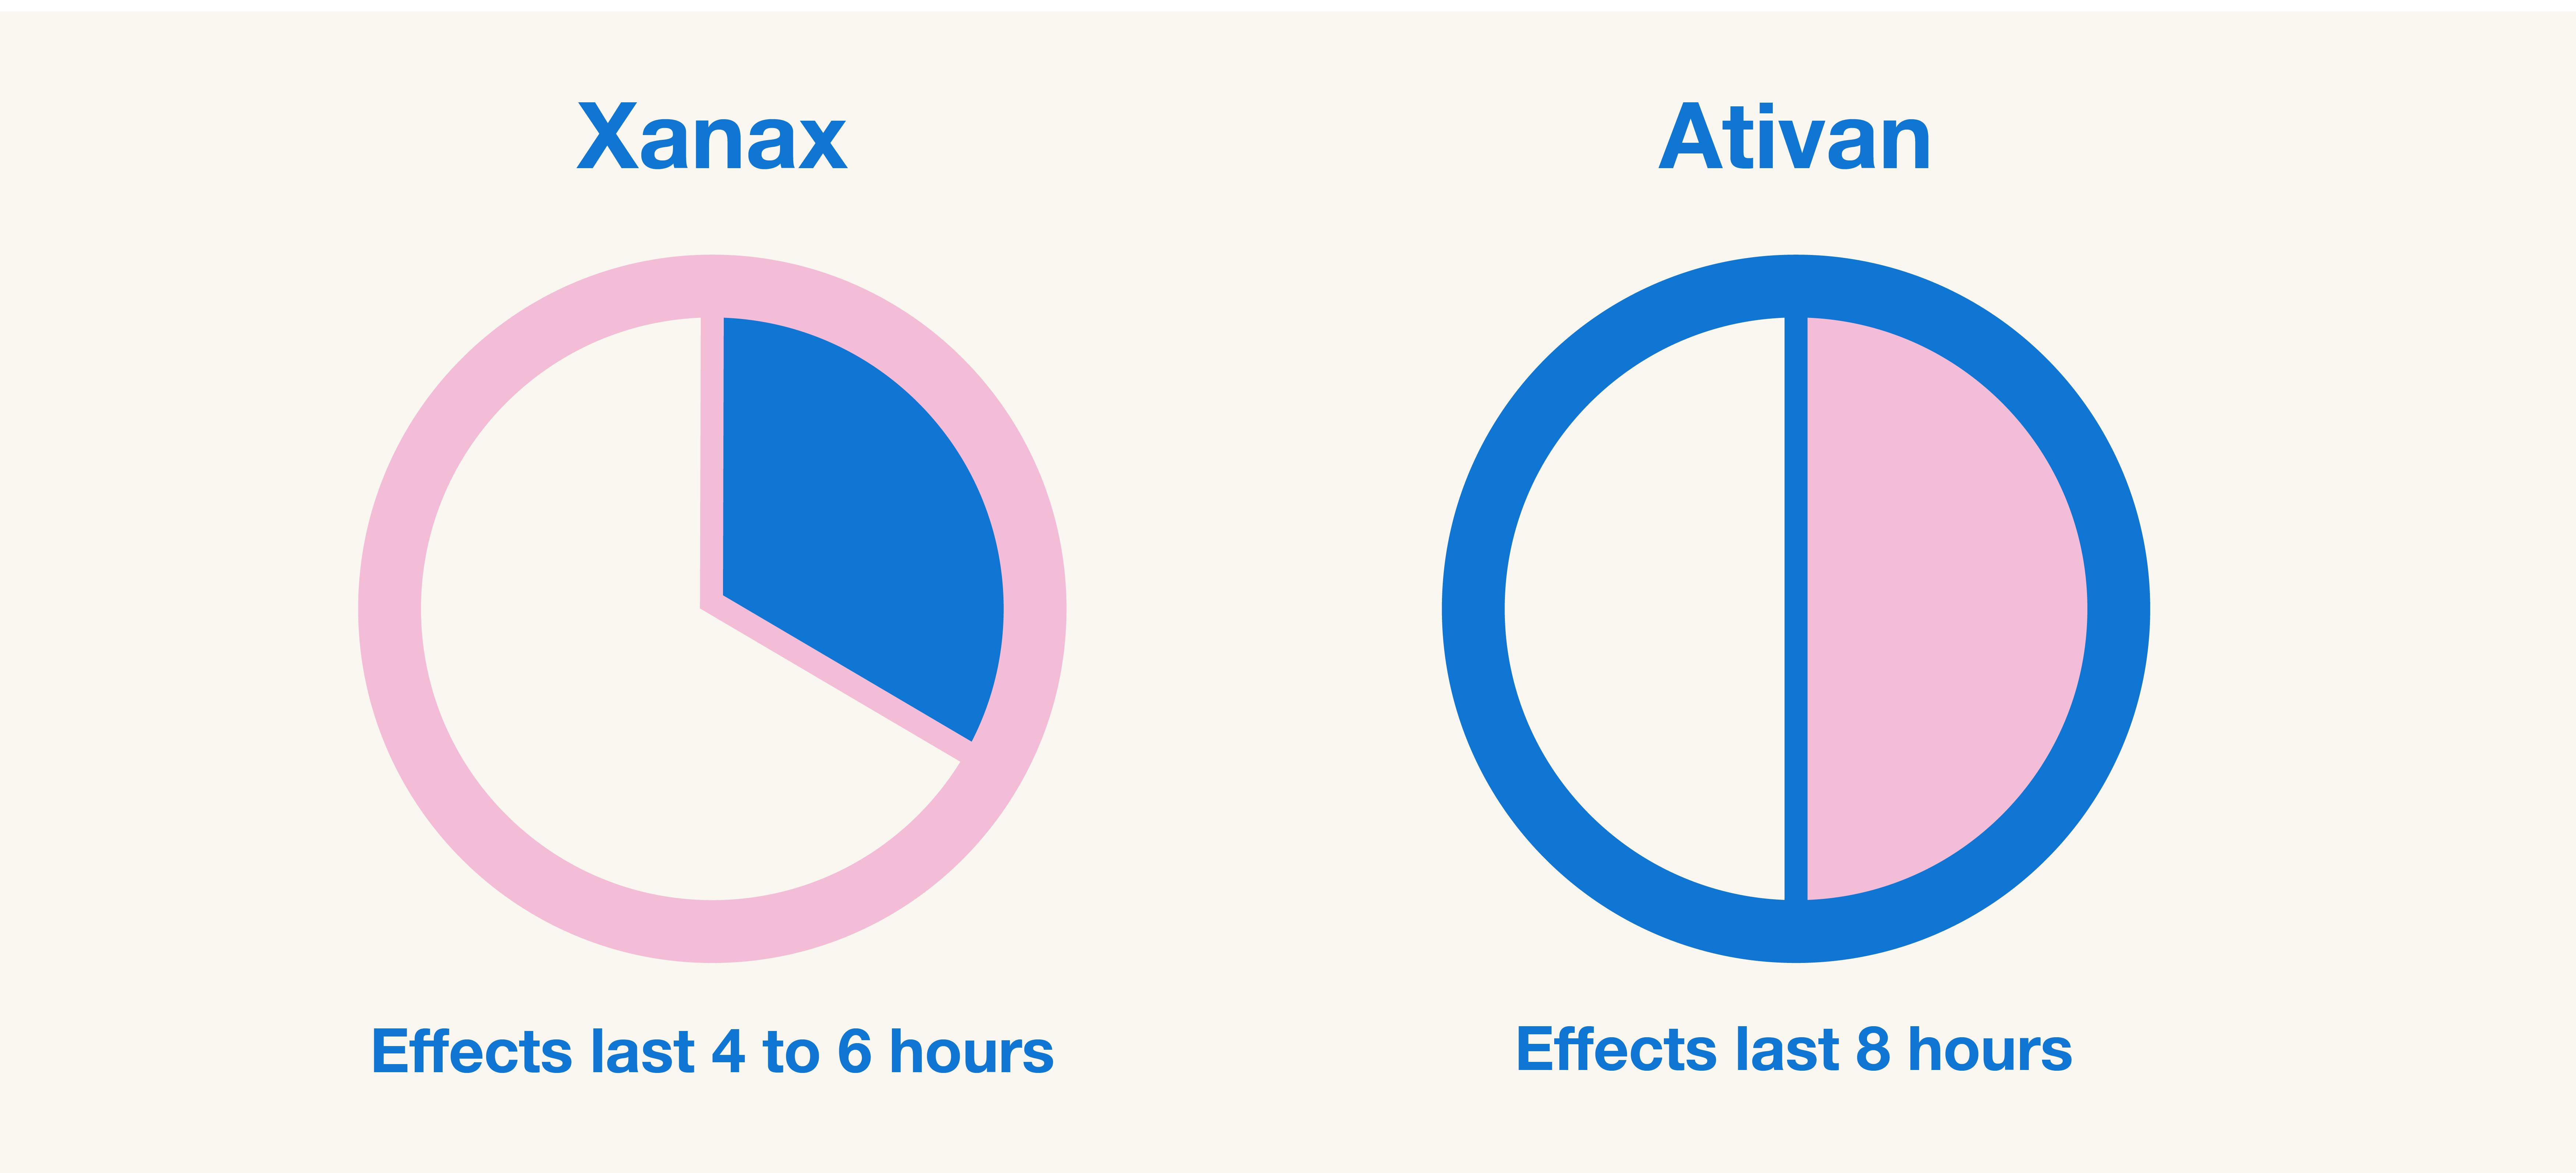 How long Xanax and Ativan last